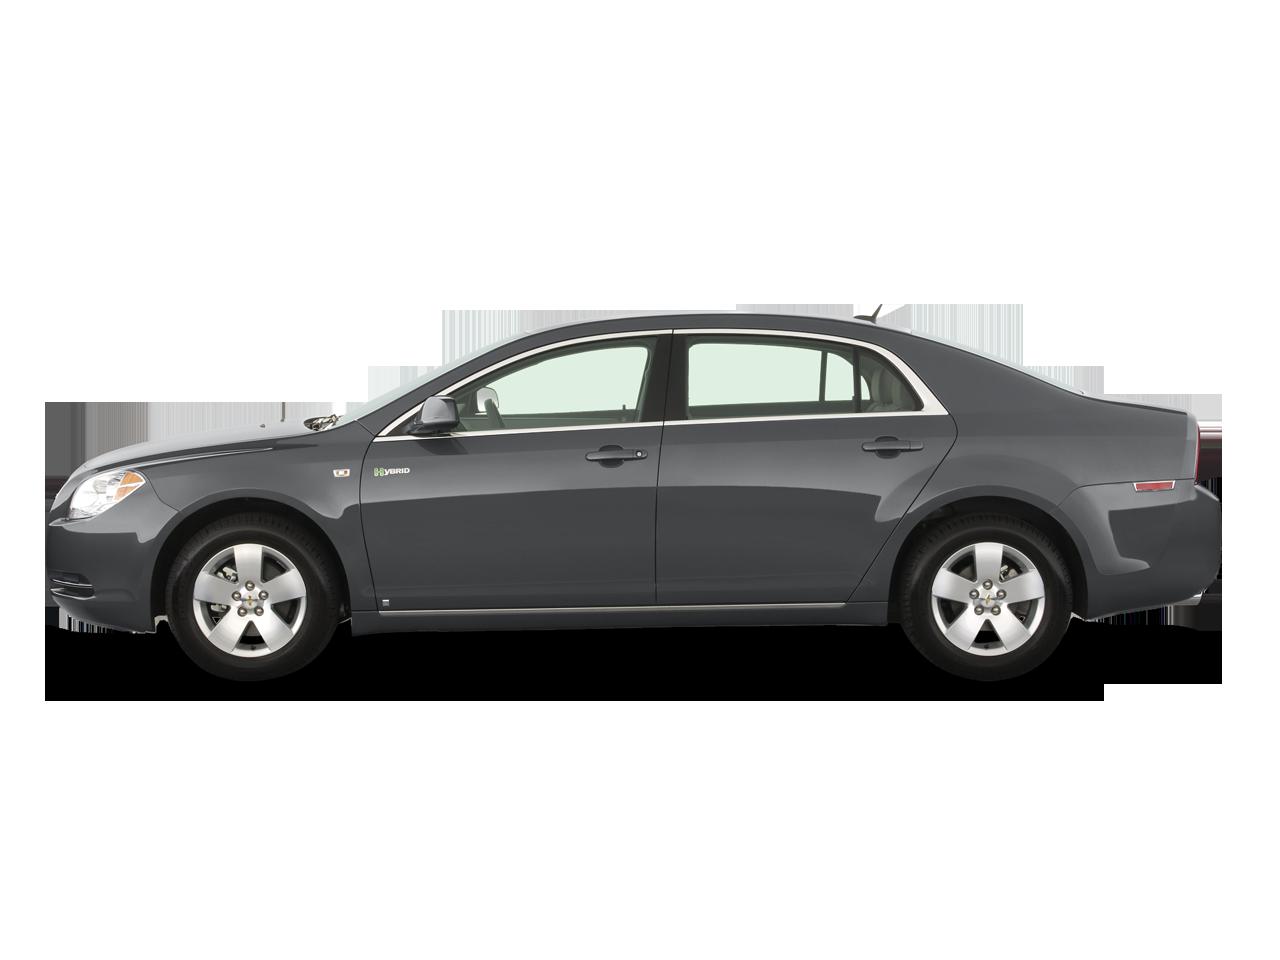 Impala 2009 chevrolet impala review : 2009 Chevy Malibu LTZ - Fuel Efficient News, Car Features and ...